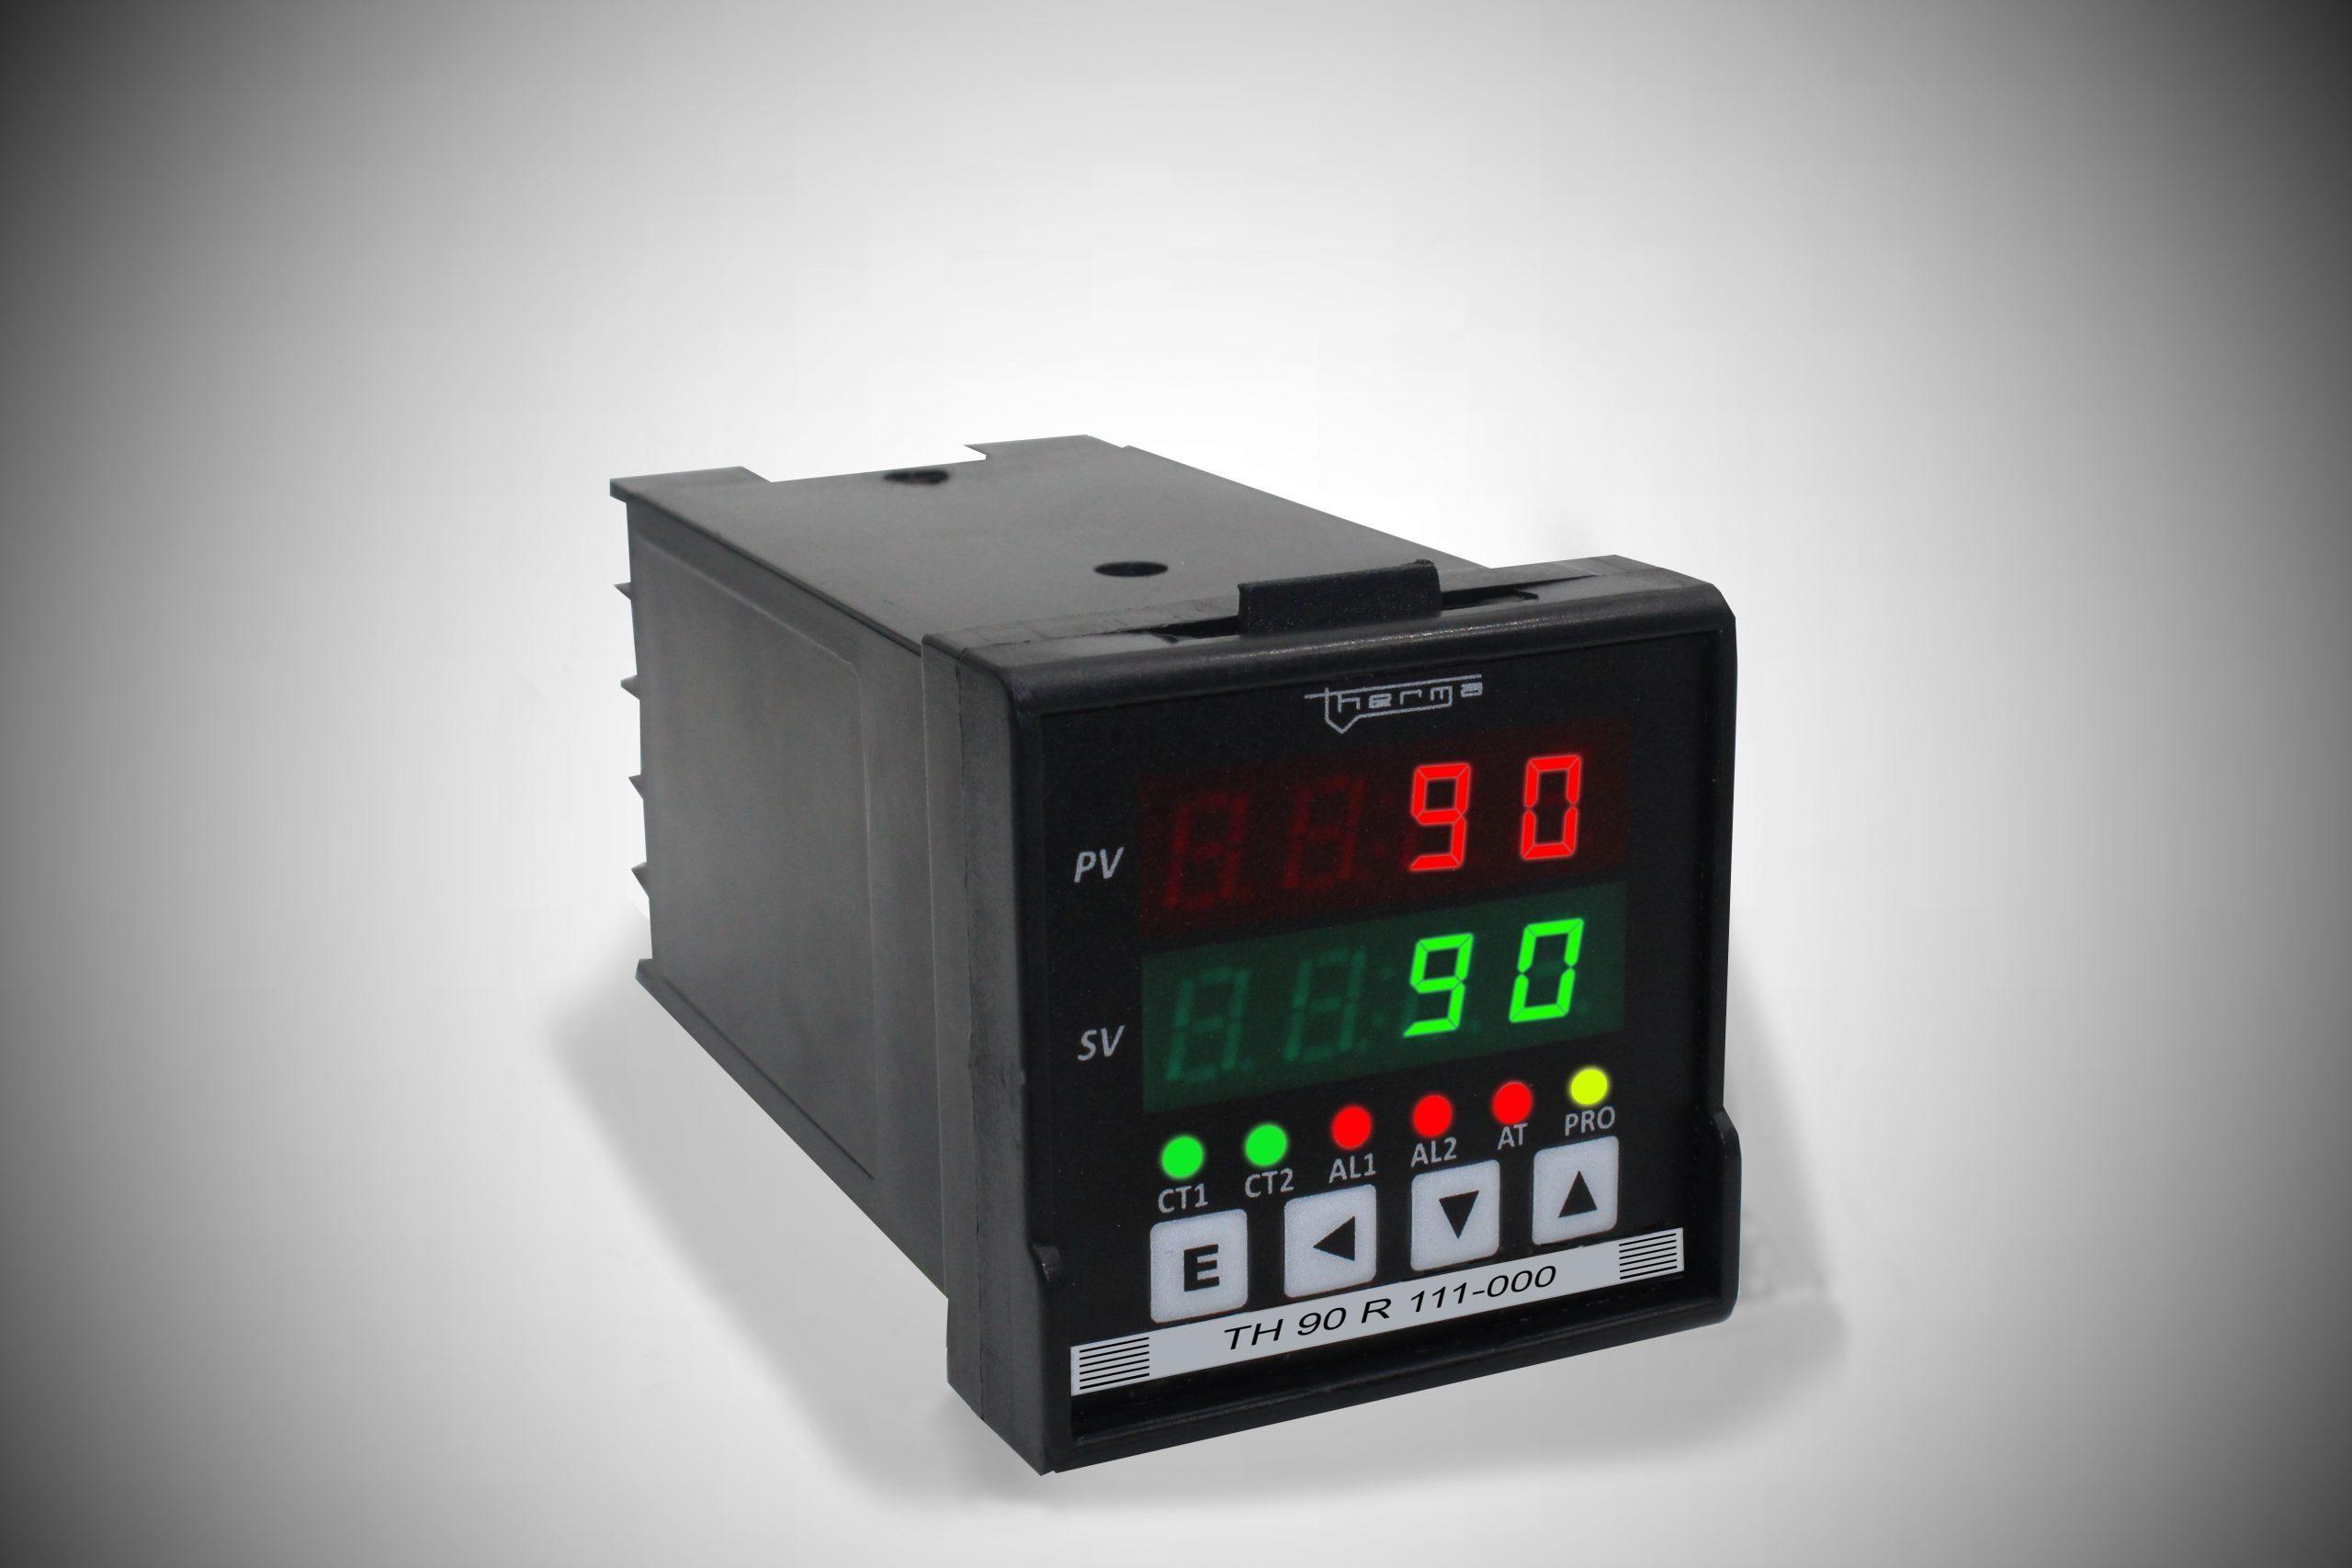 Controlador de indicador de temperatura